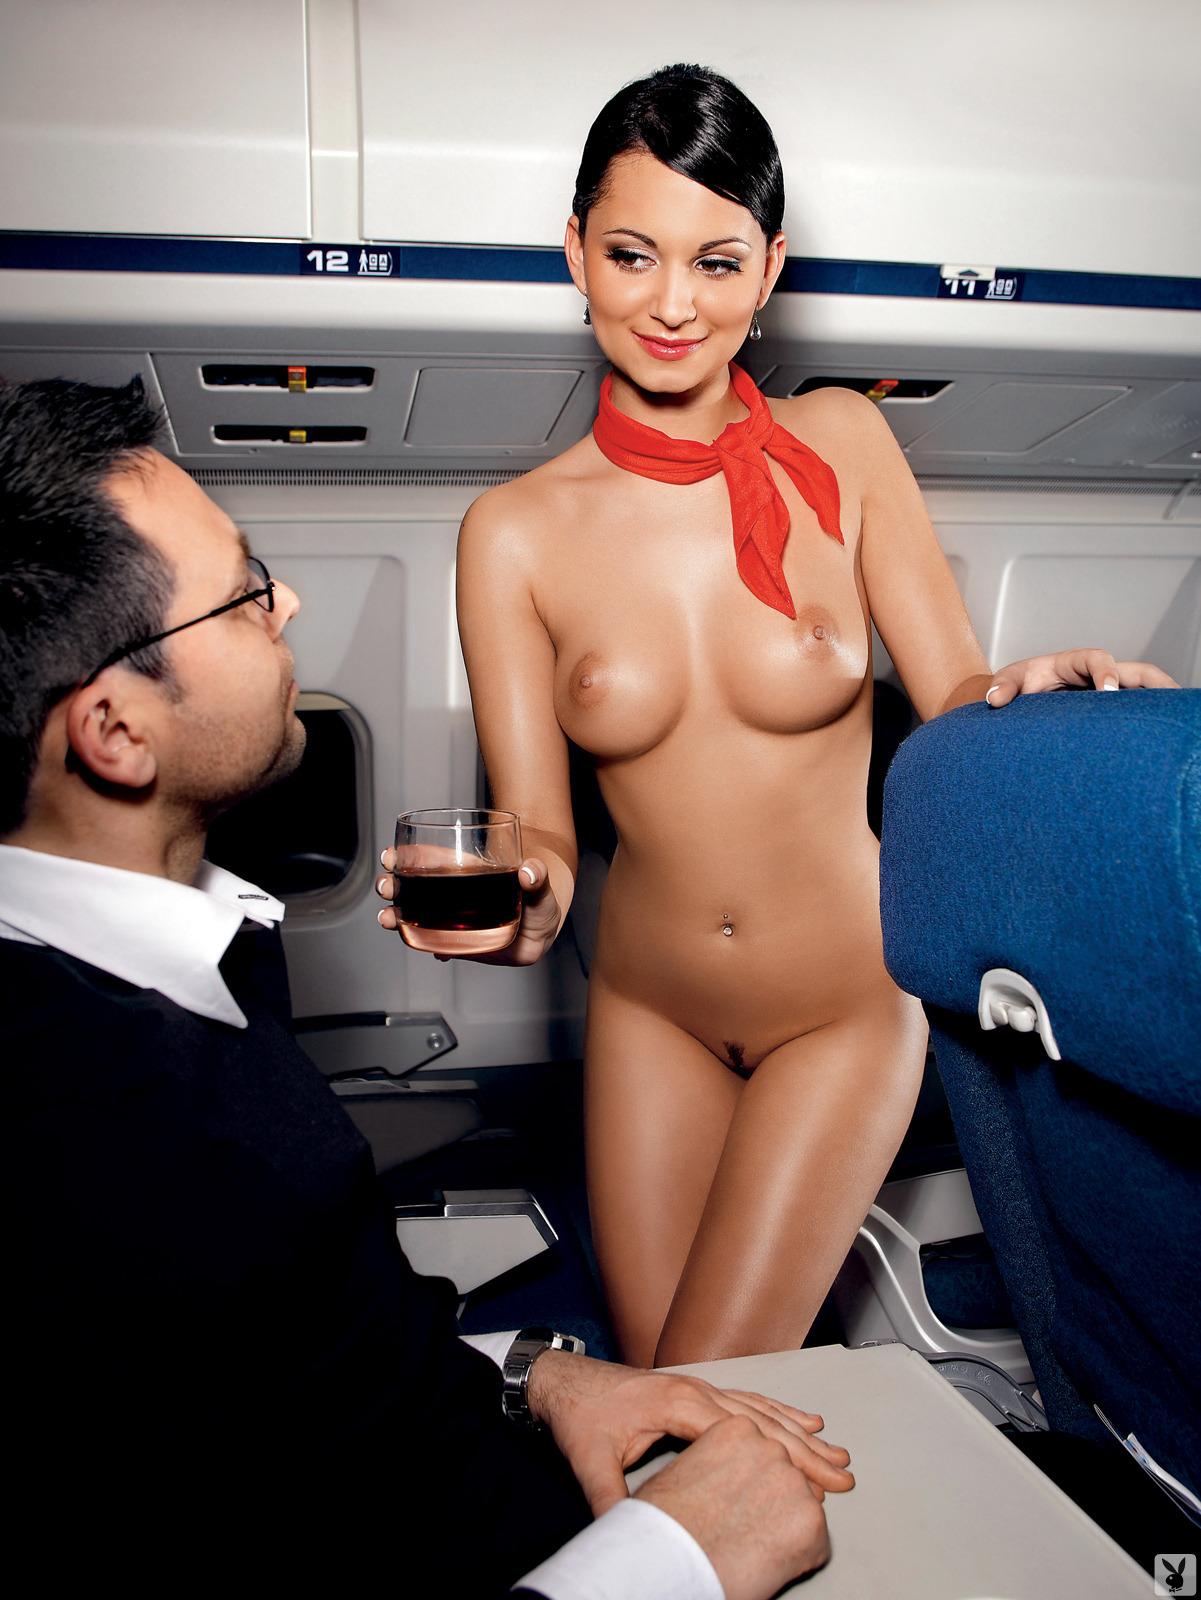 Pakistani air hostess sex in airlines porno pics